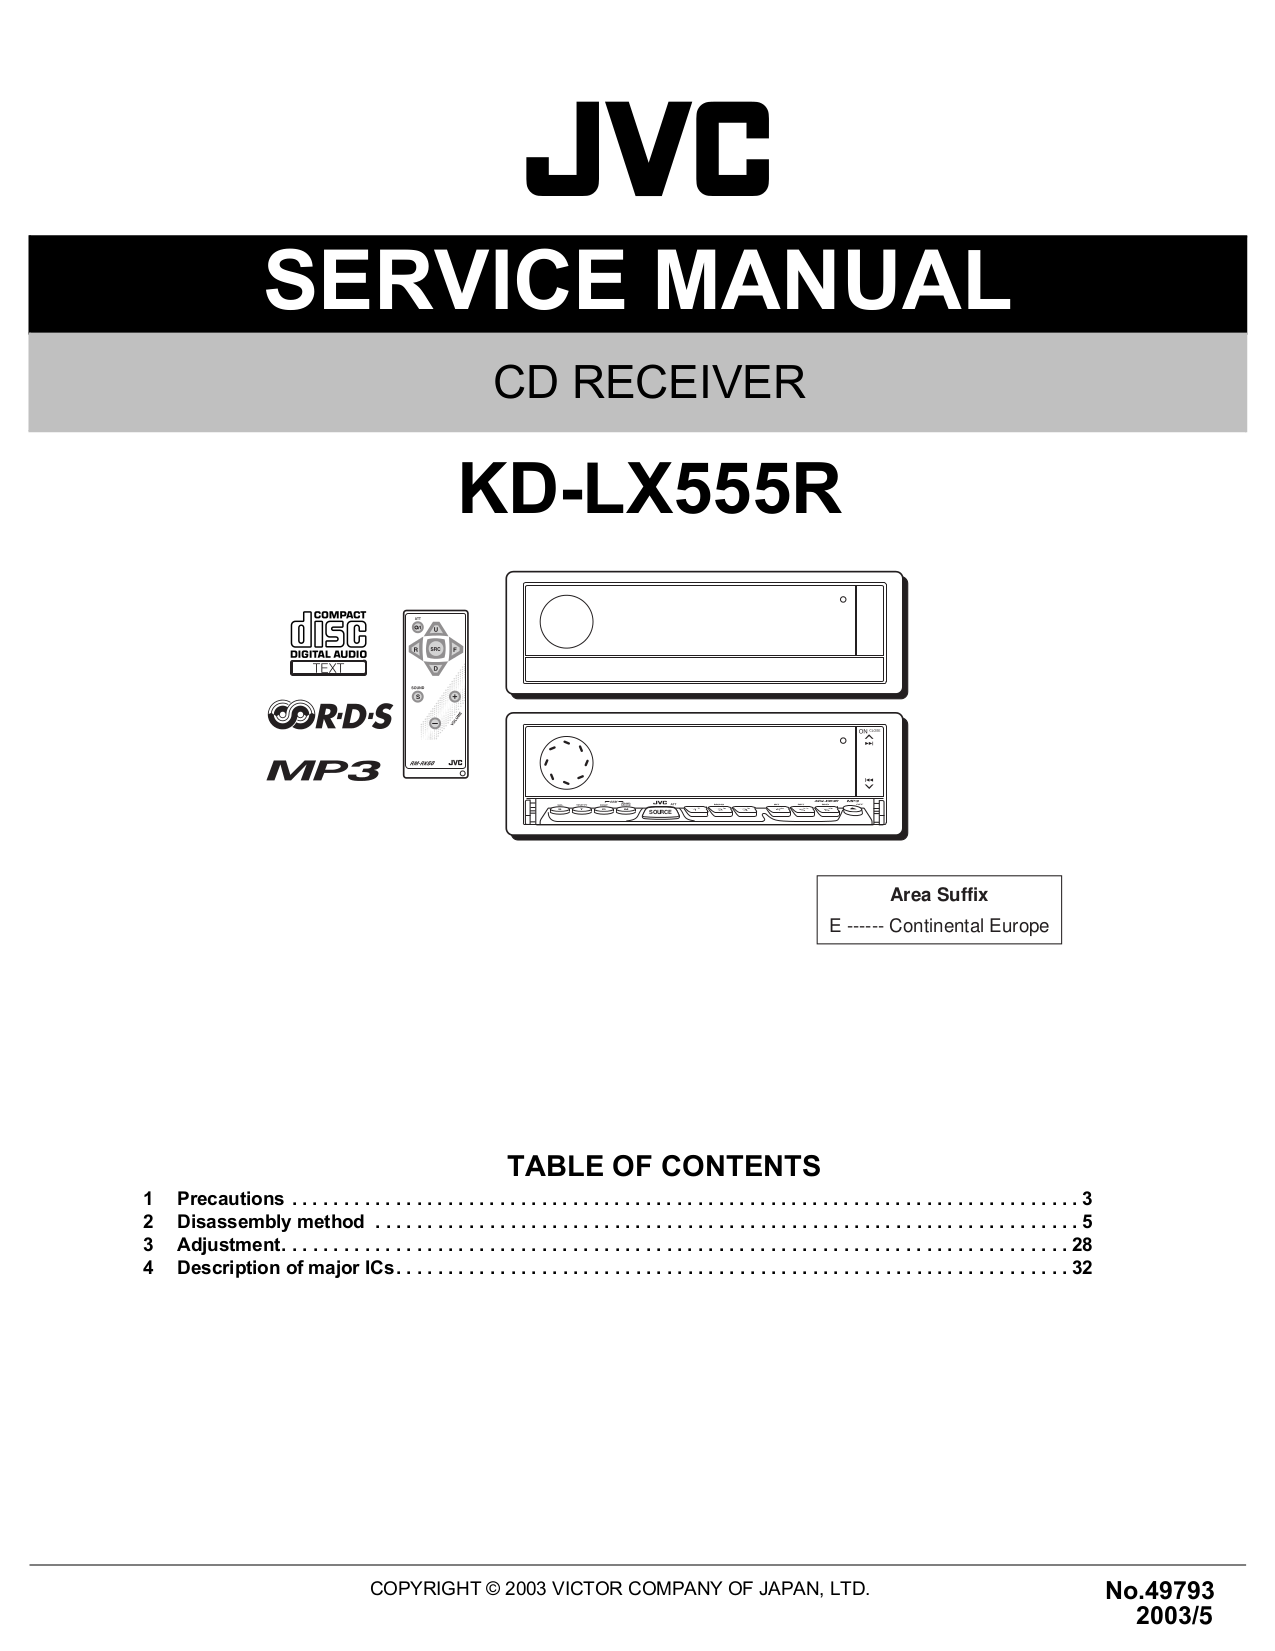 Download free pdf for jvc kd-s641 car receiver manual.